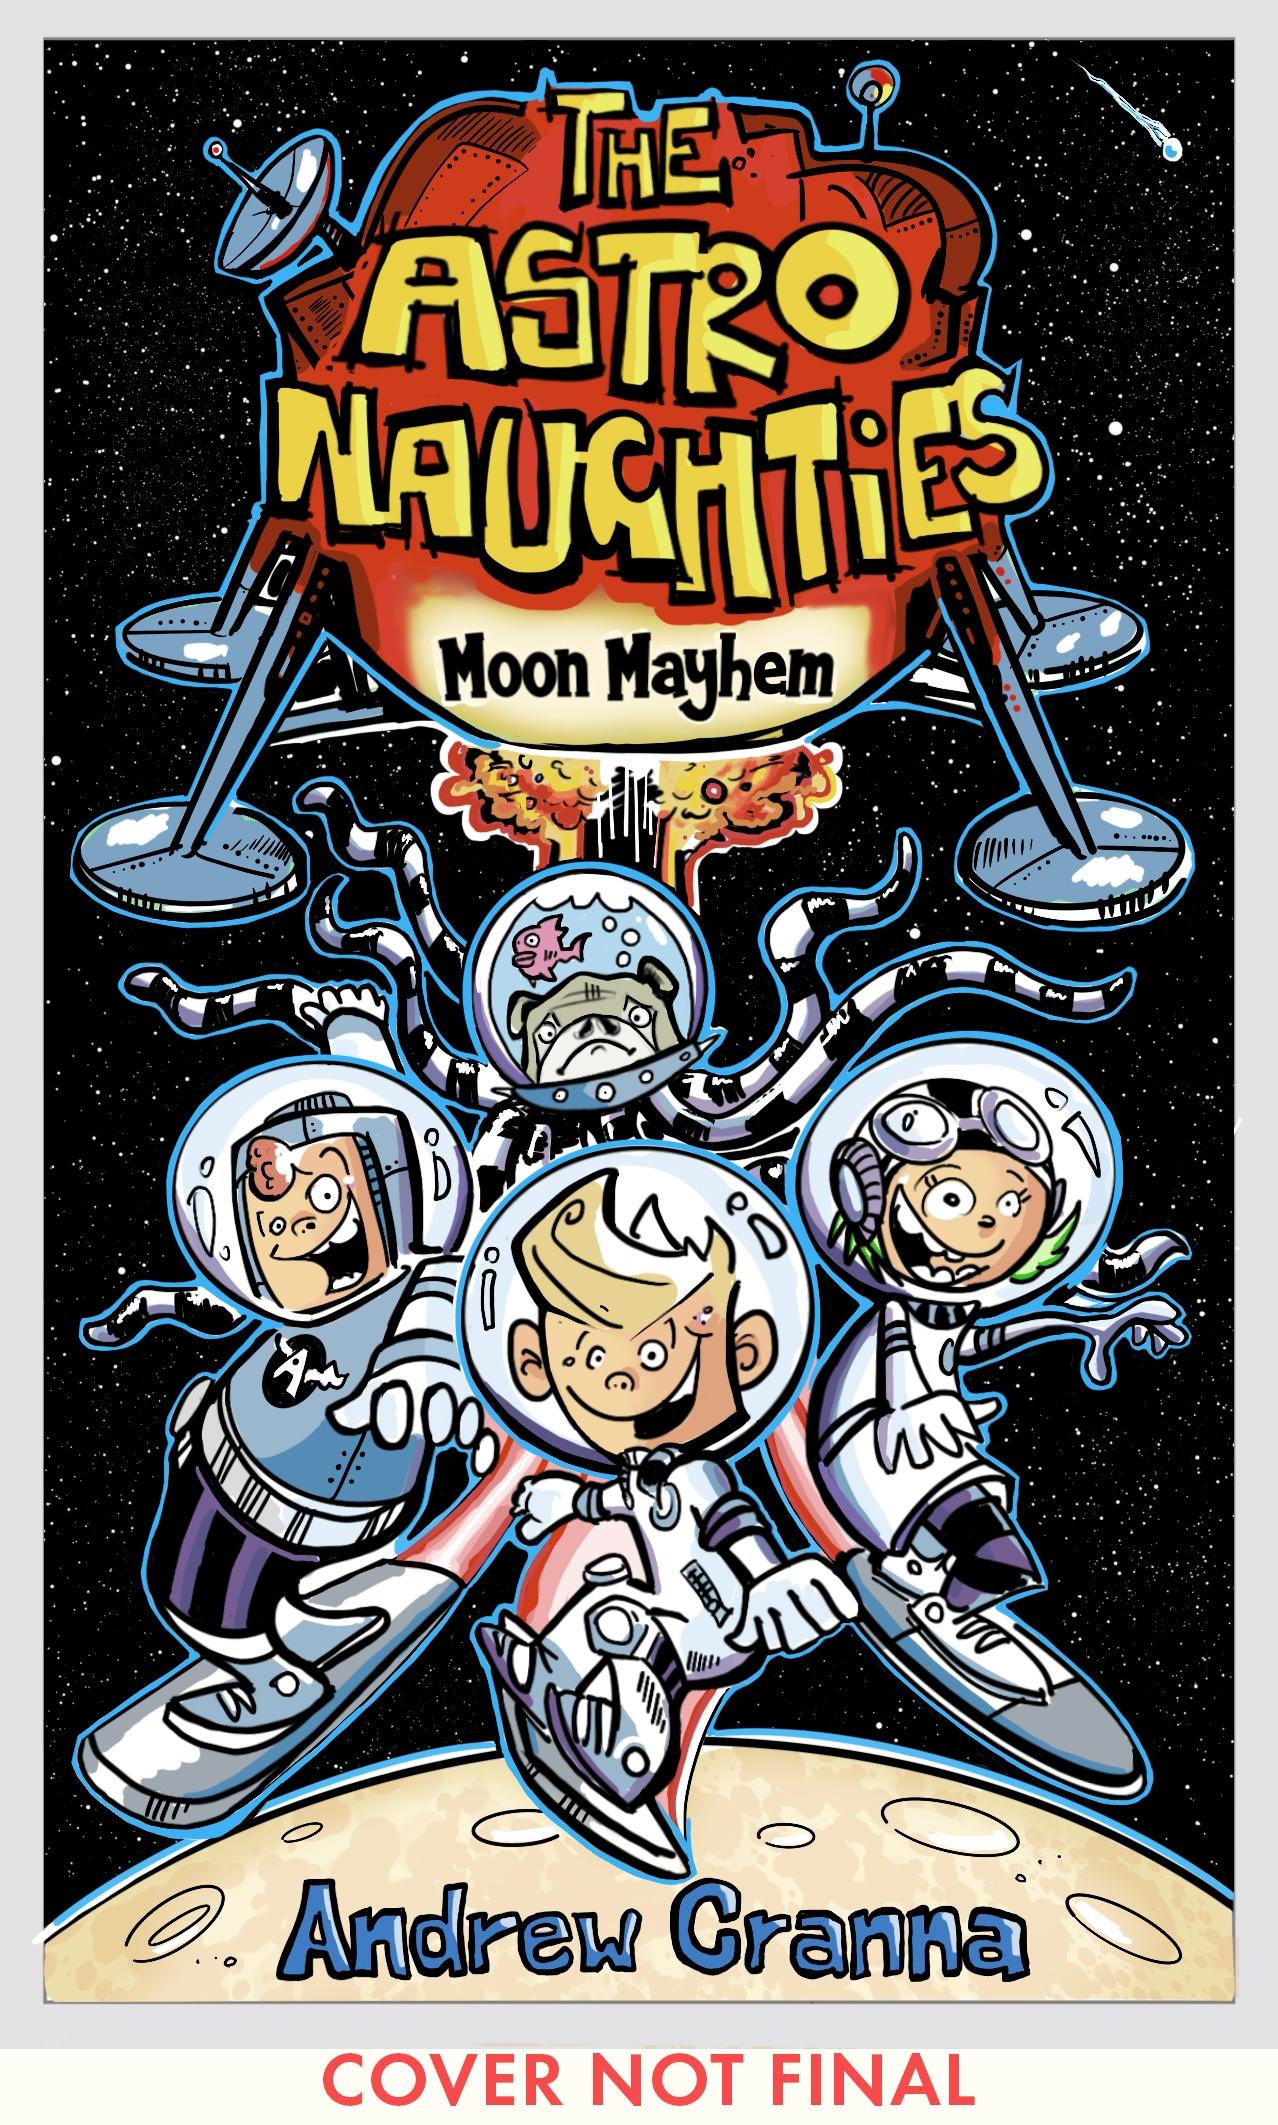 Astronaughties: Moon Mayhem